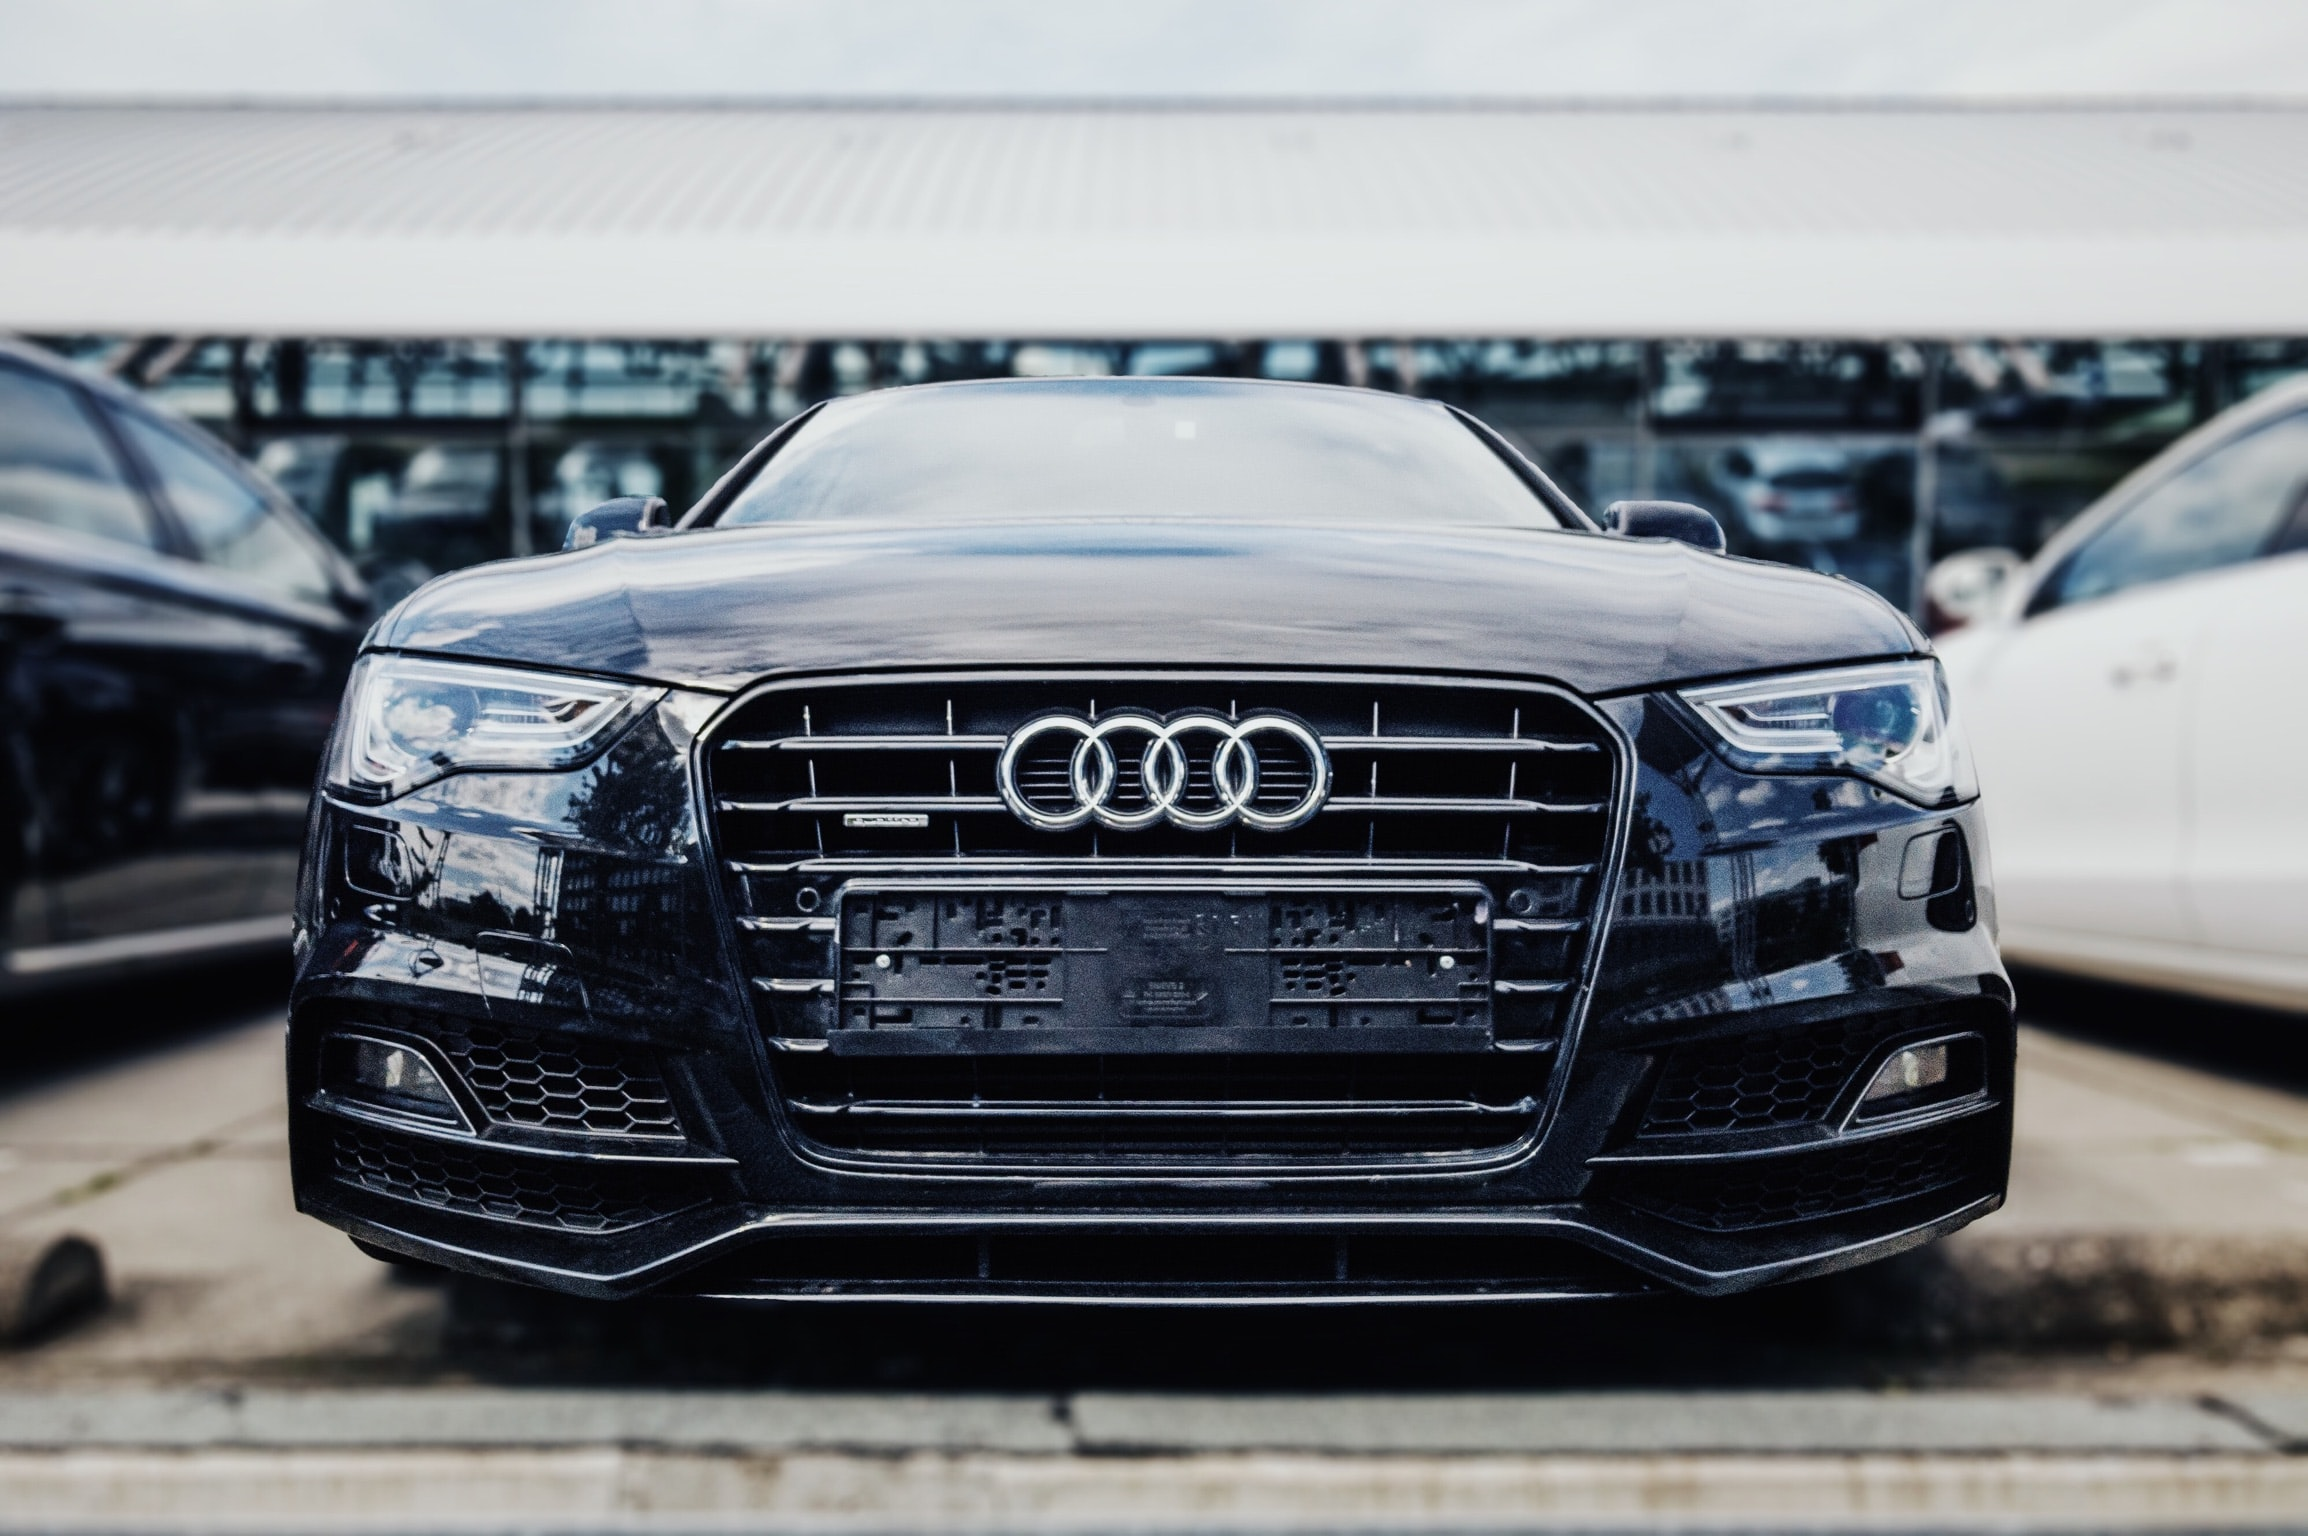 shallow focus photography of black Audi sedan